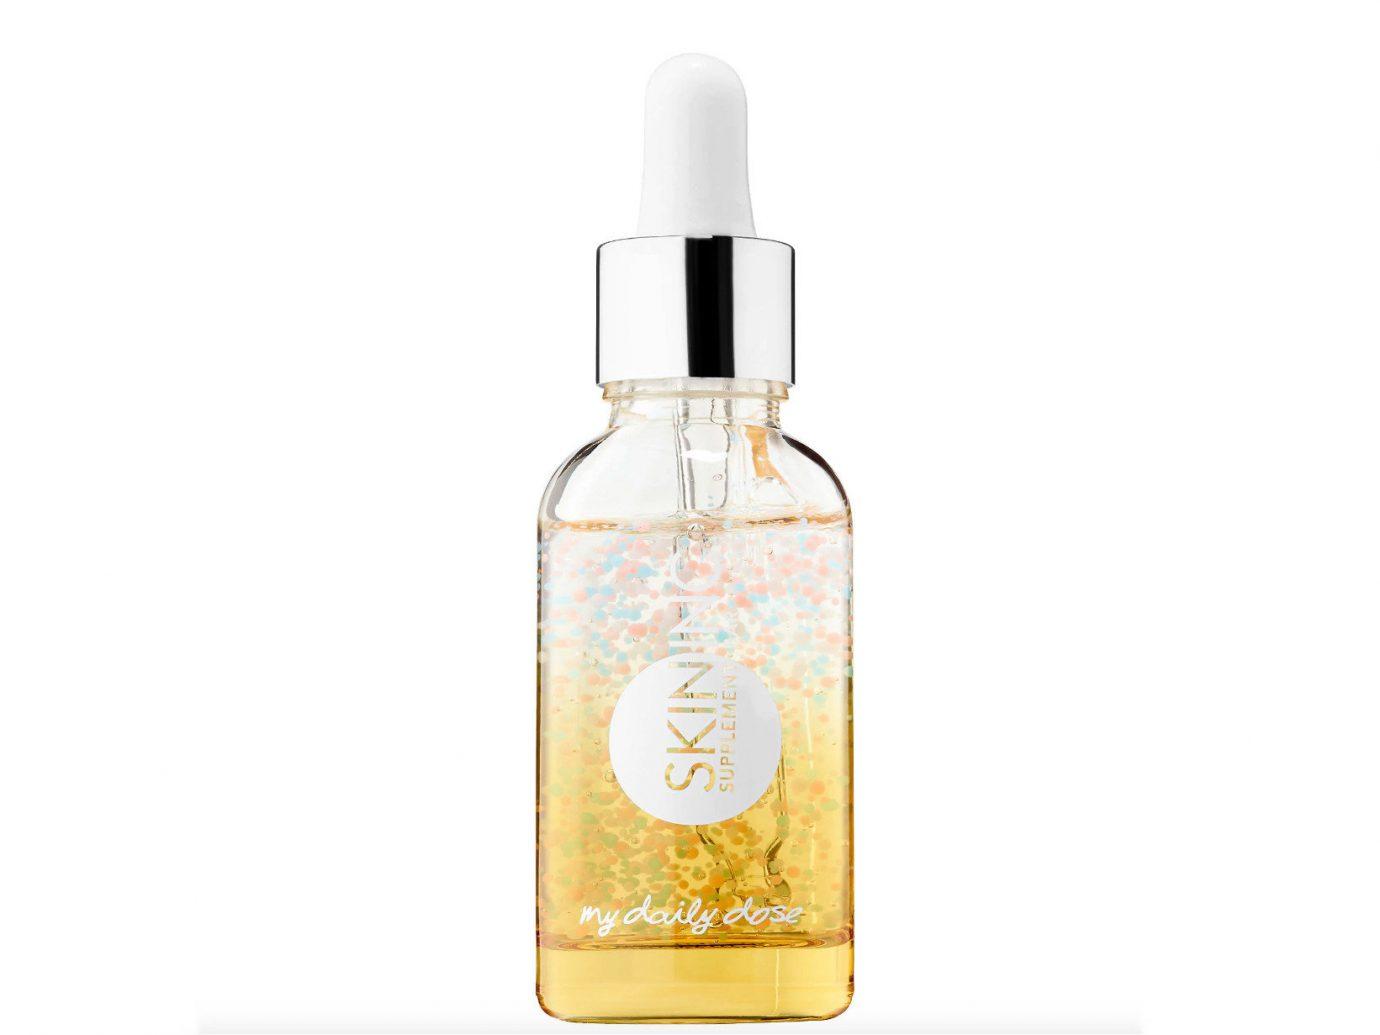 Beauty Health + Wellness Travel Shop toiletry product liquid bottle